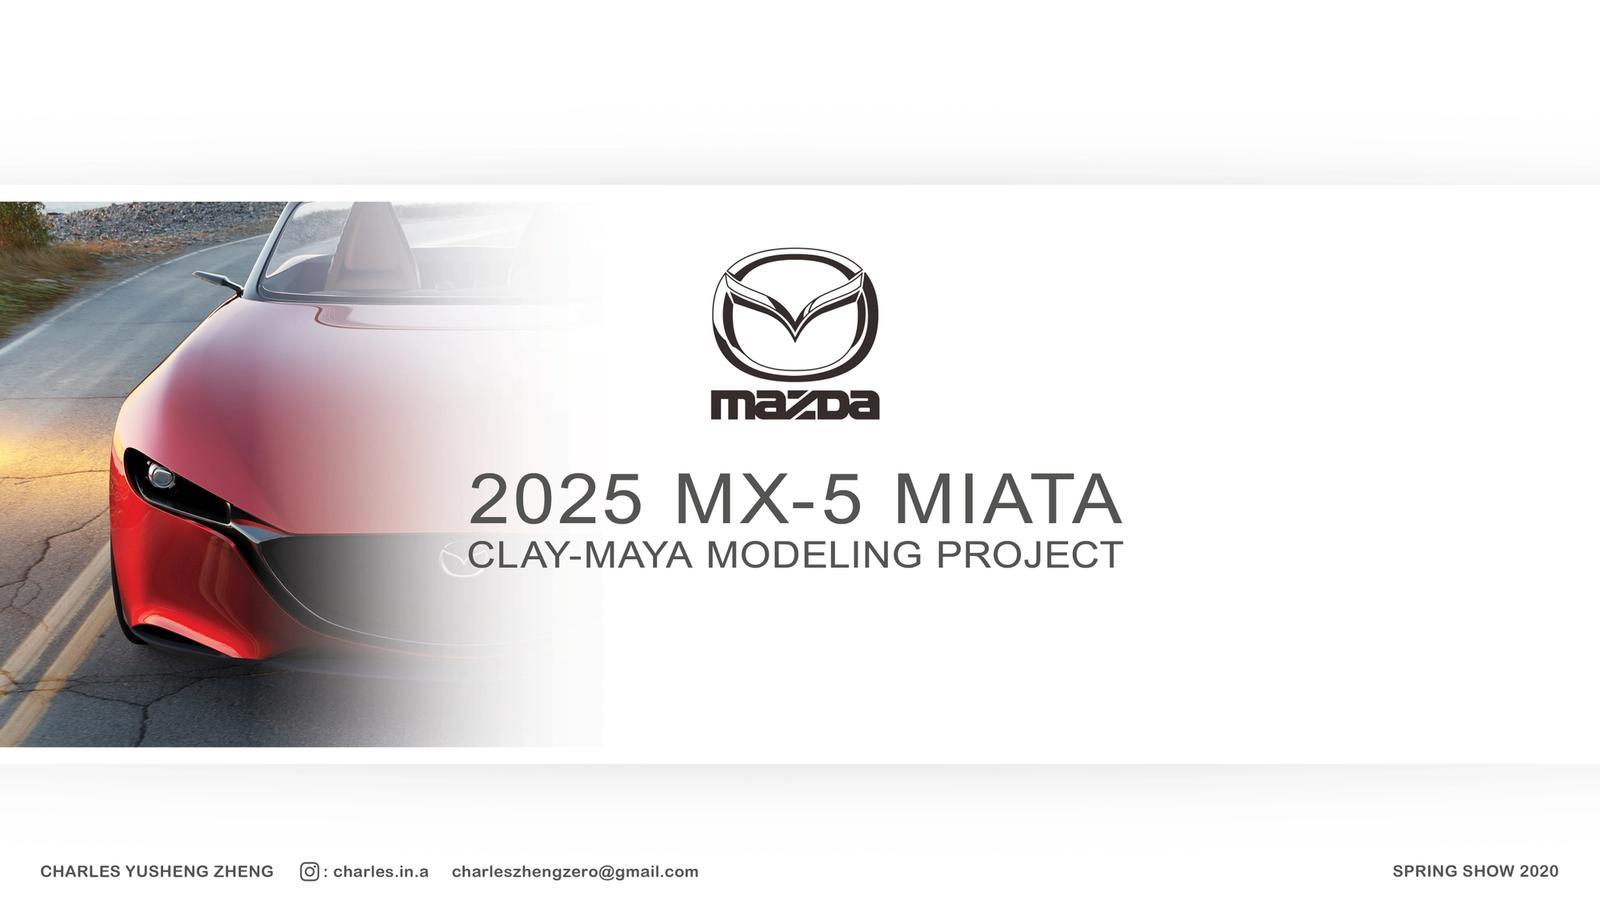 2025 Mazda Miata Concept Clay-Maya Modeling Project